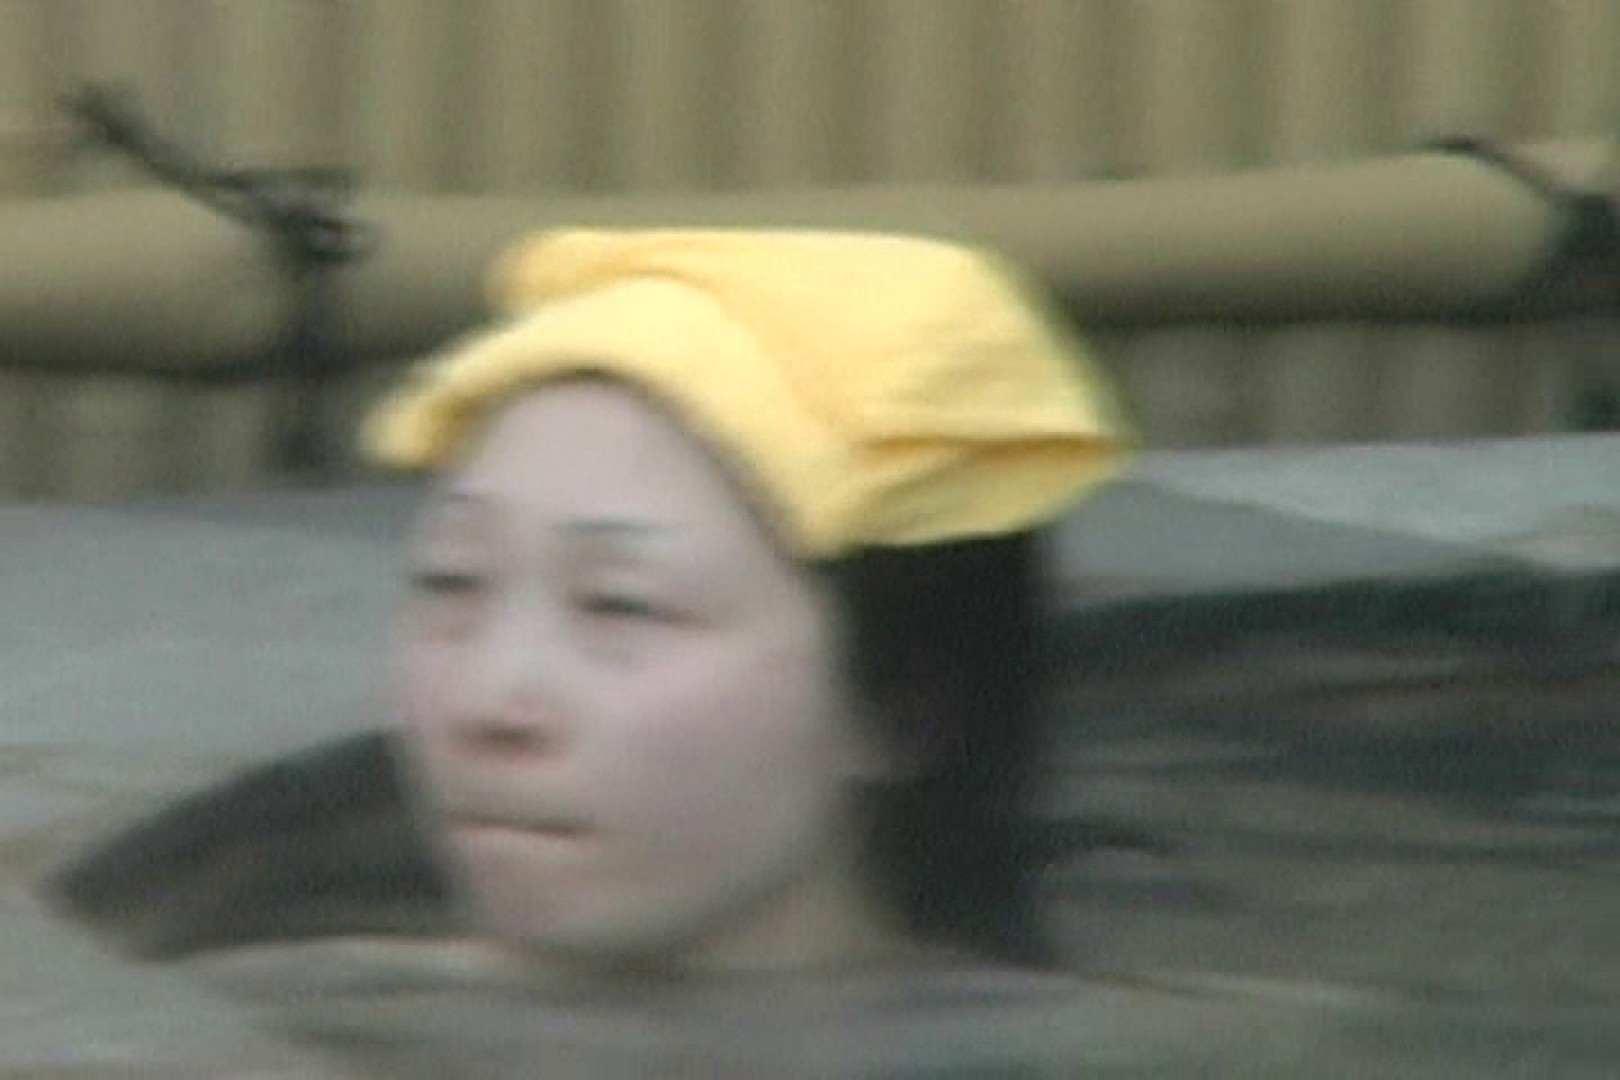 Aquaな露天風呂Vol.596 露天 覗きおまんこ画像 77画像 35